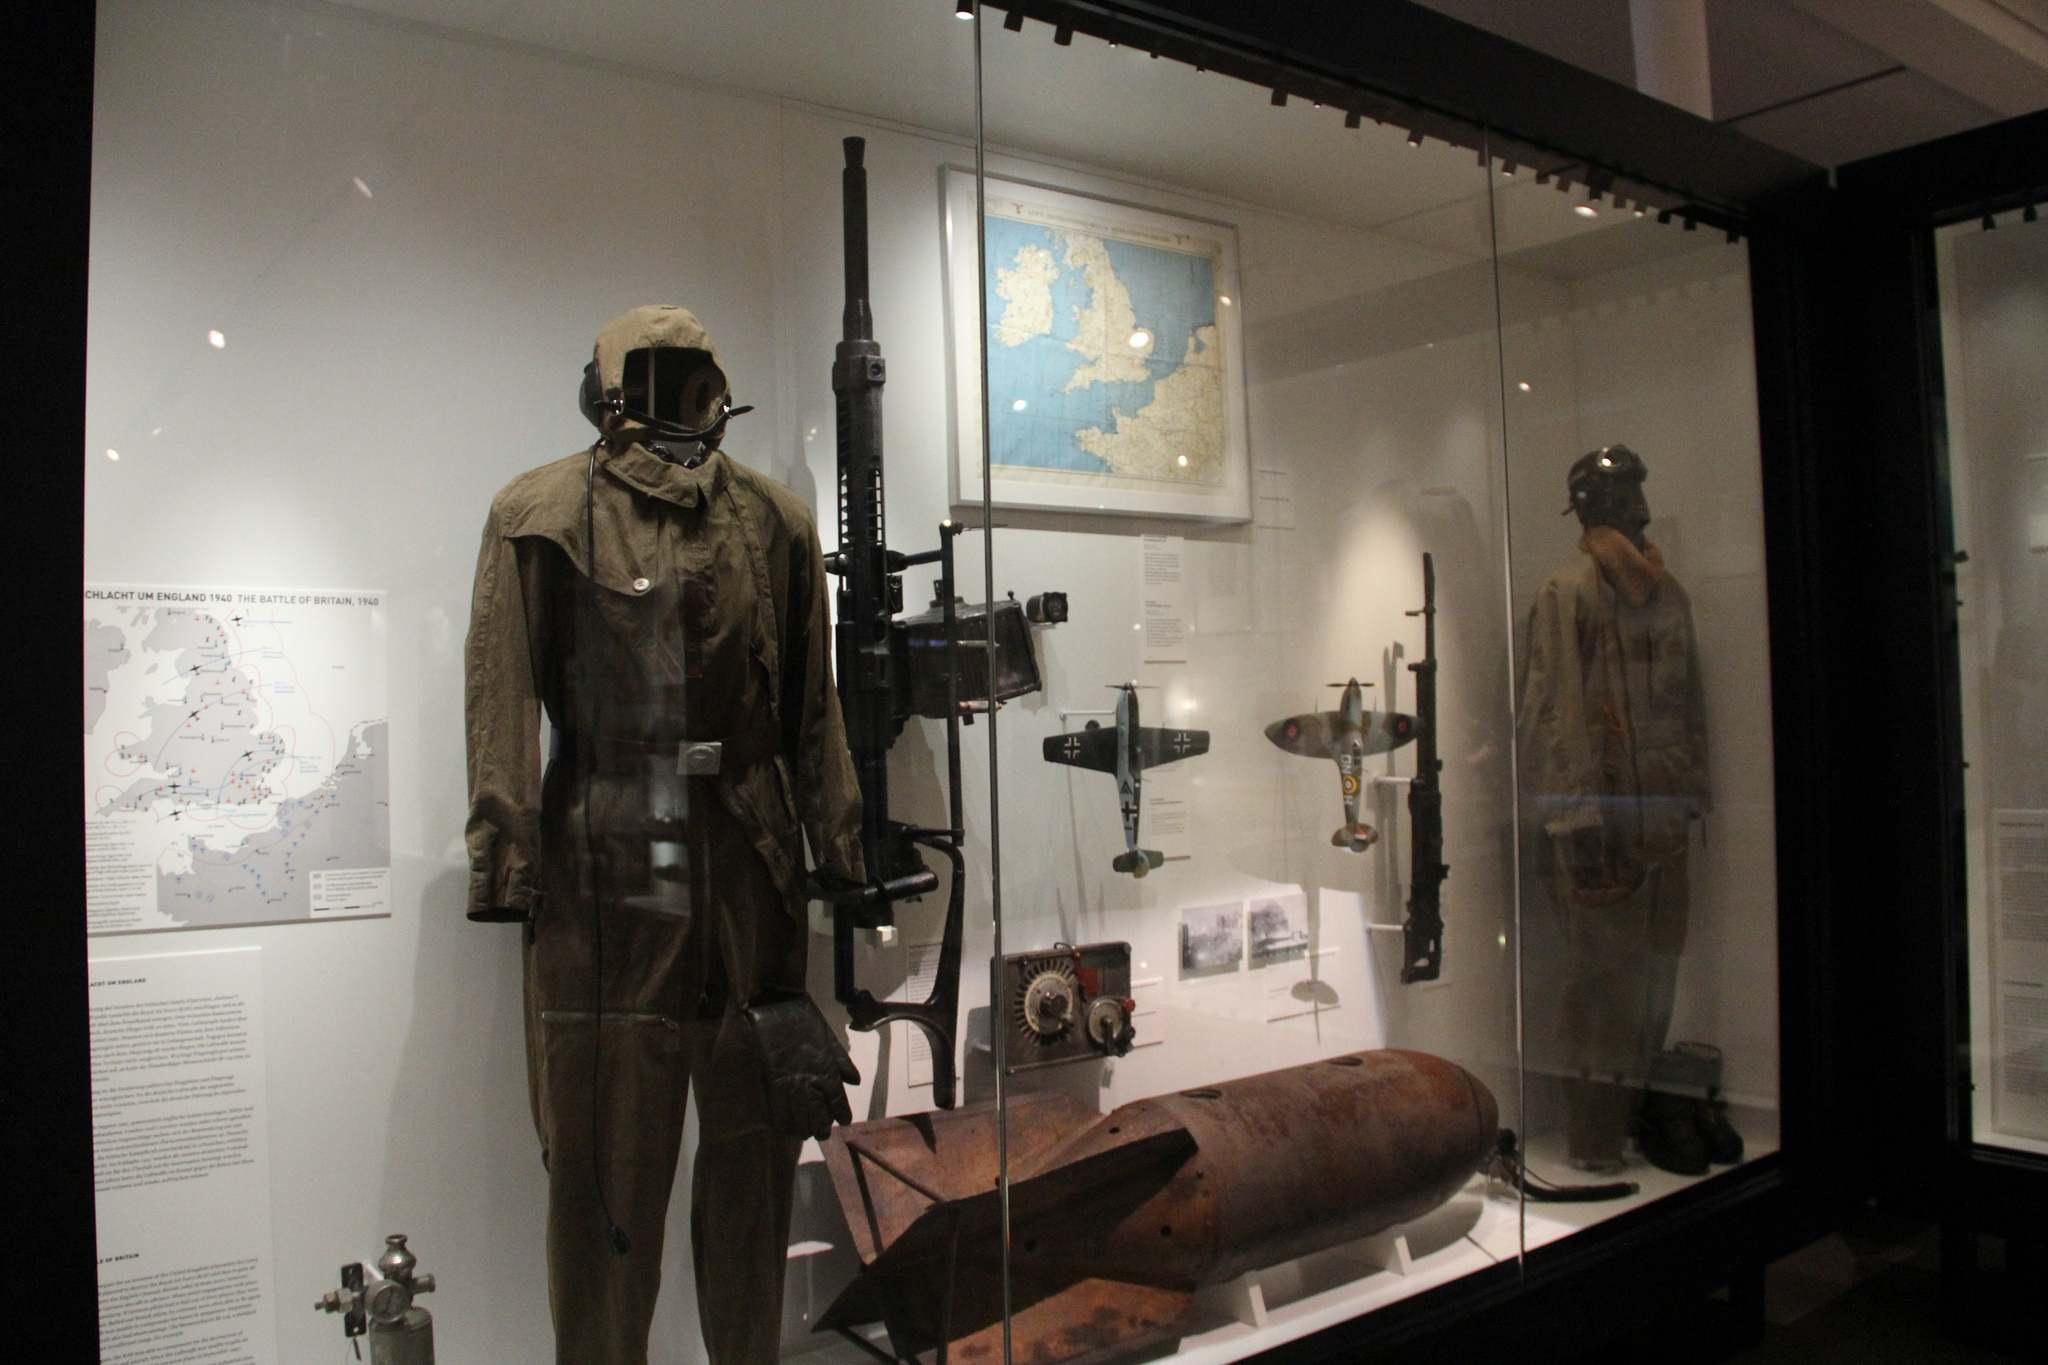 german military museum12 Bundeswehr Military History Museum